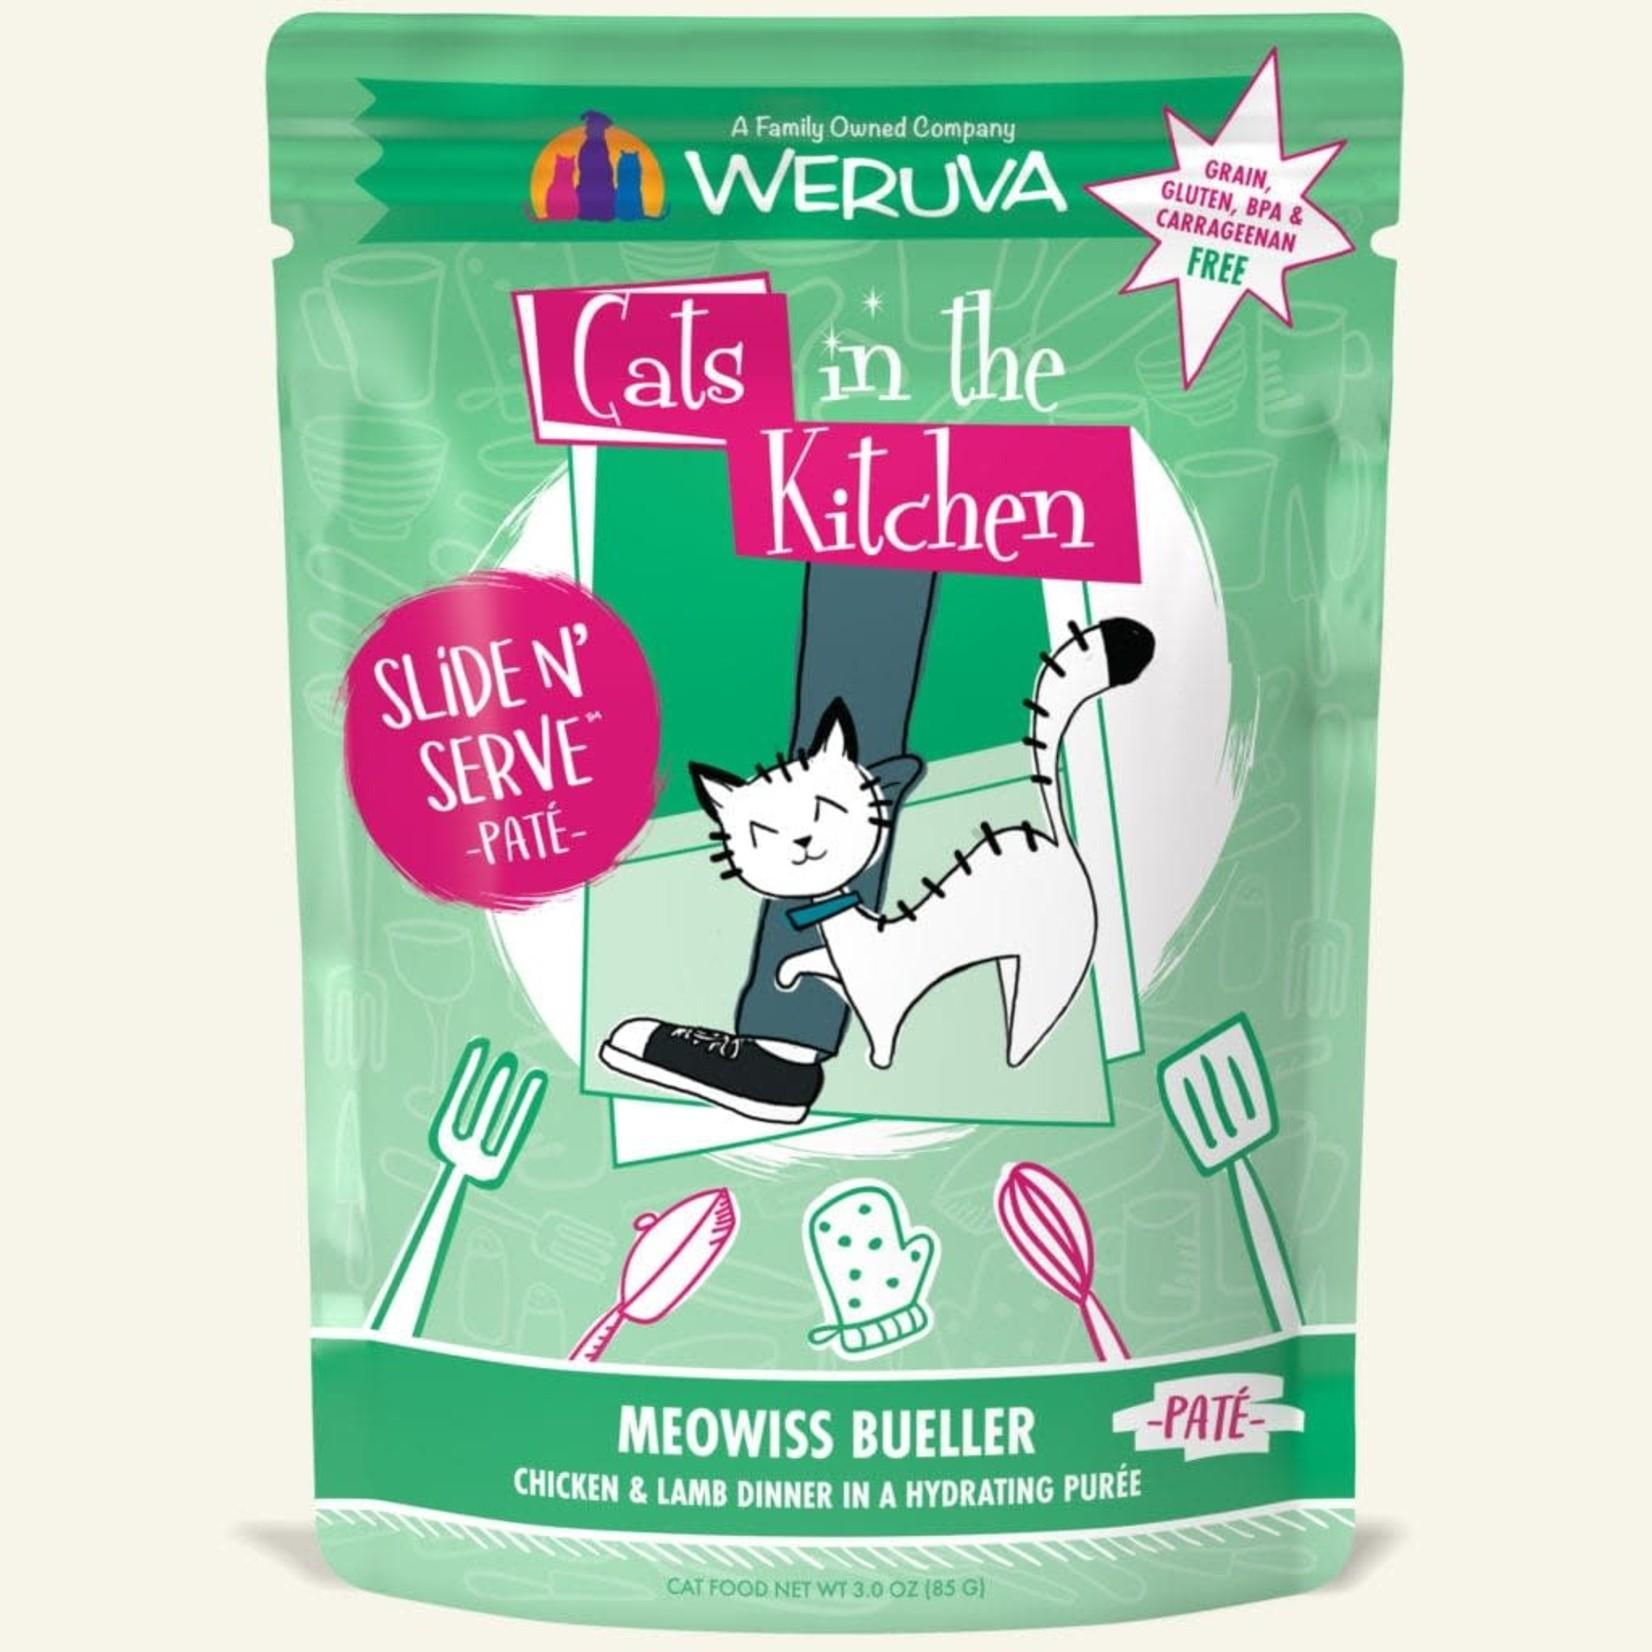 Weruva Cats In The Kitchen Meowiss Bueller 3 OZ Pouch